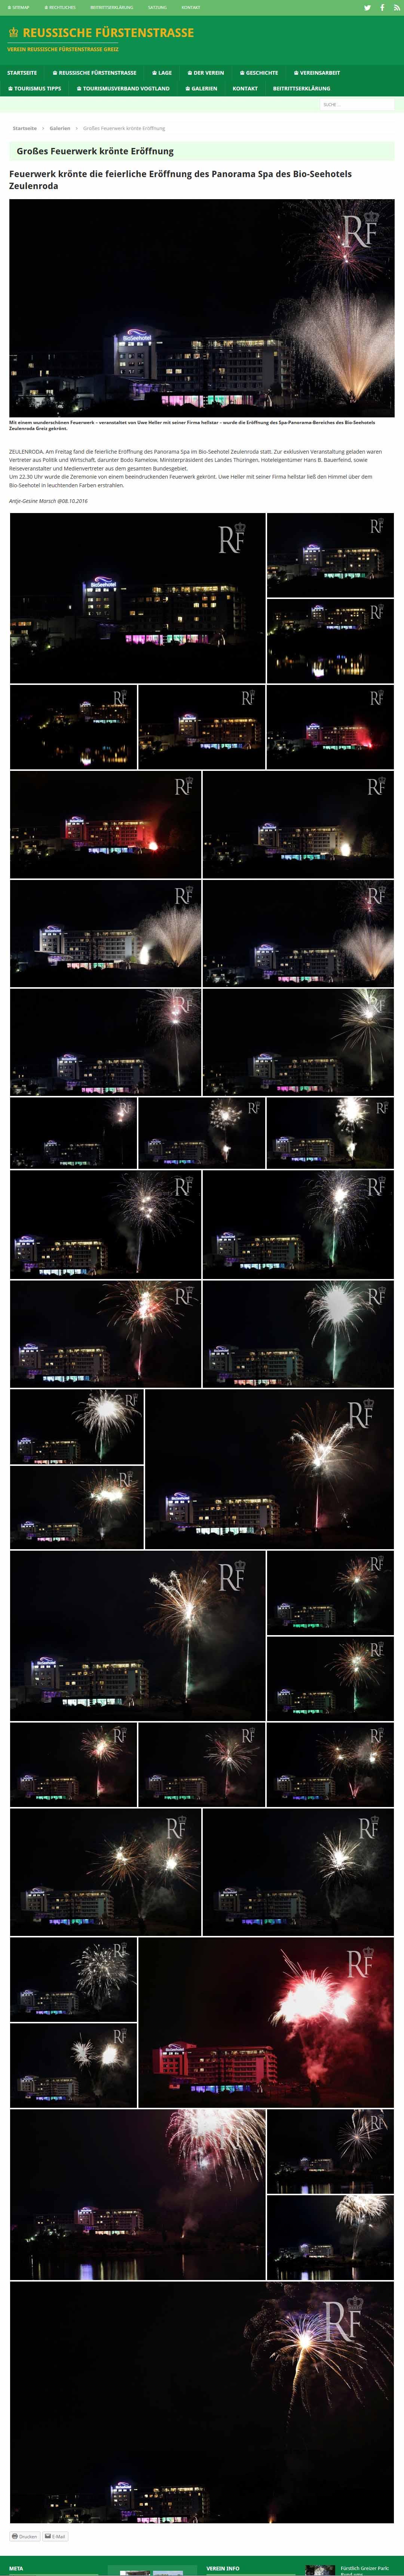 Feuerwerk Zeulenroda Bio-Seehotel